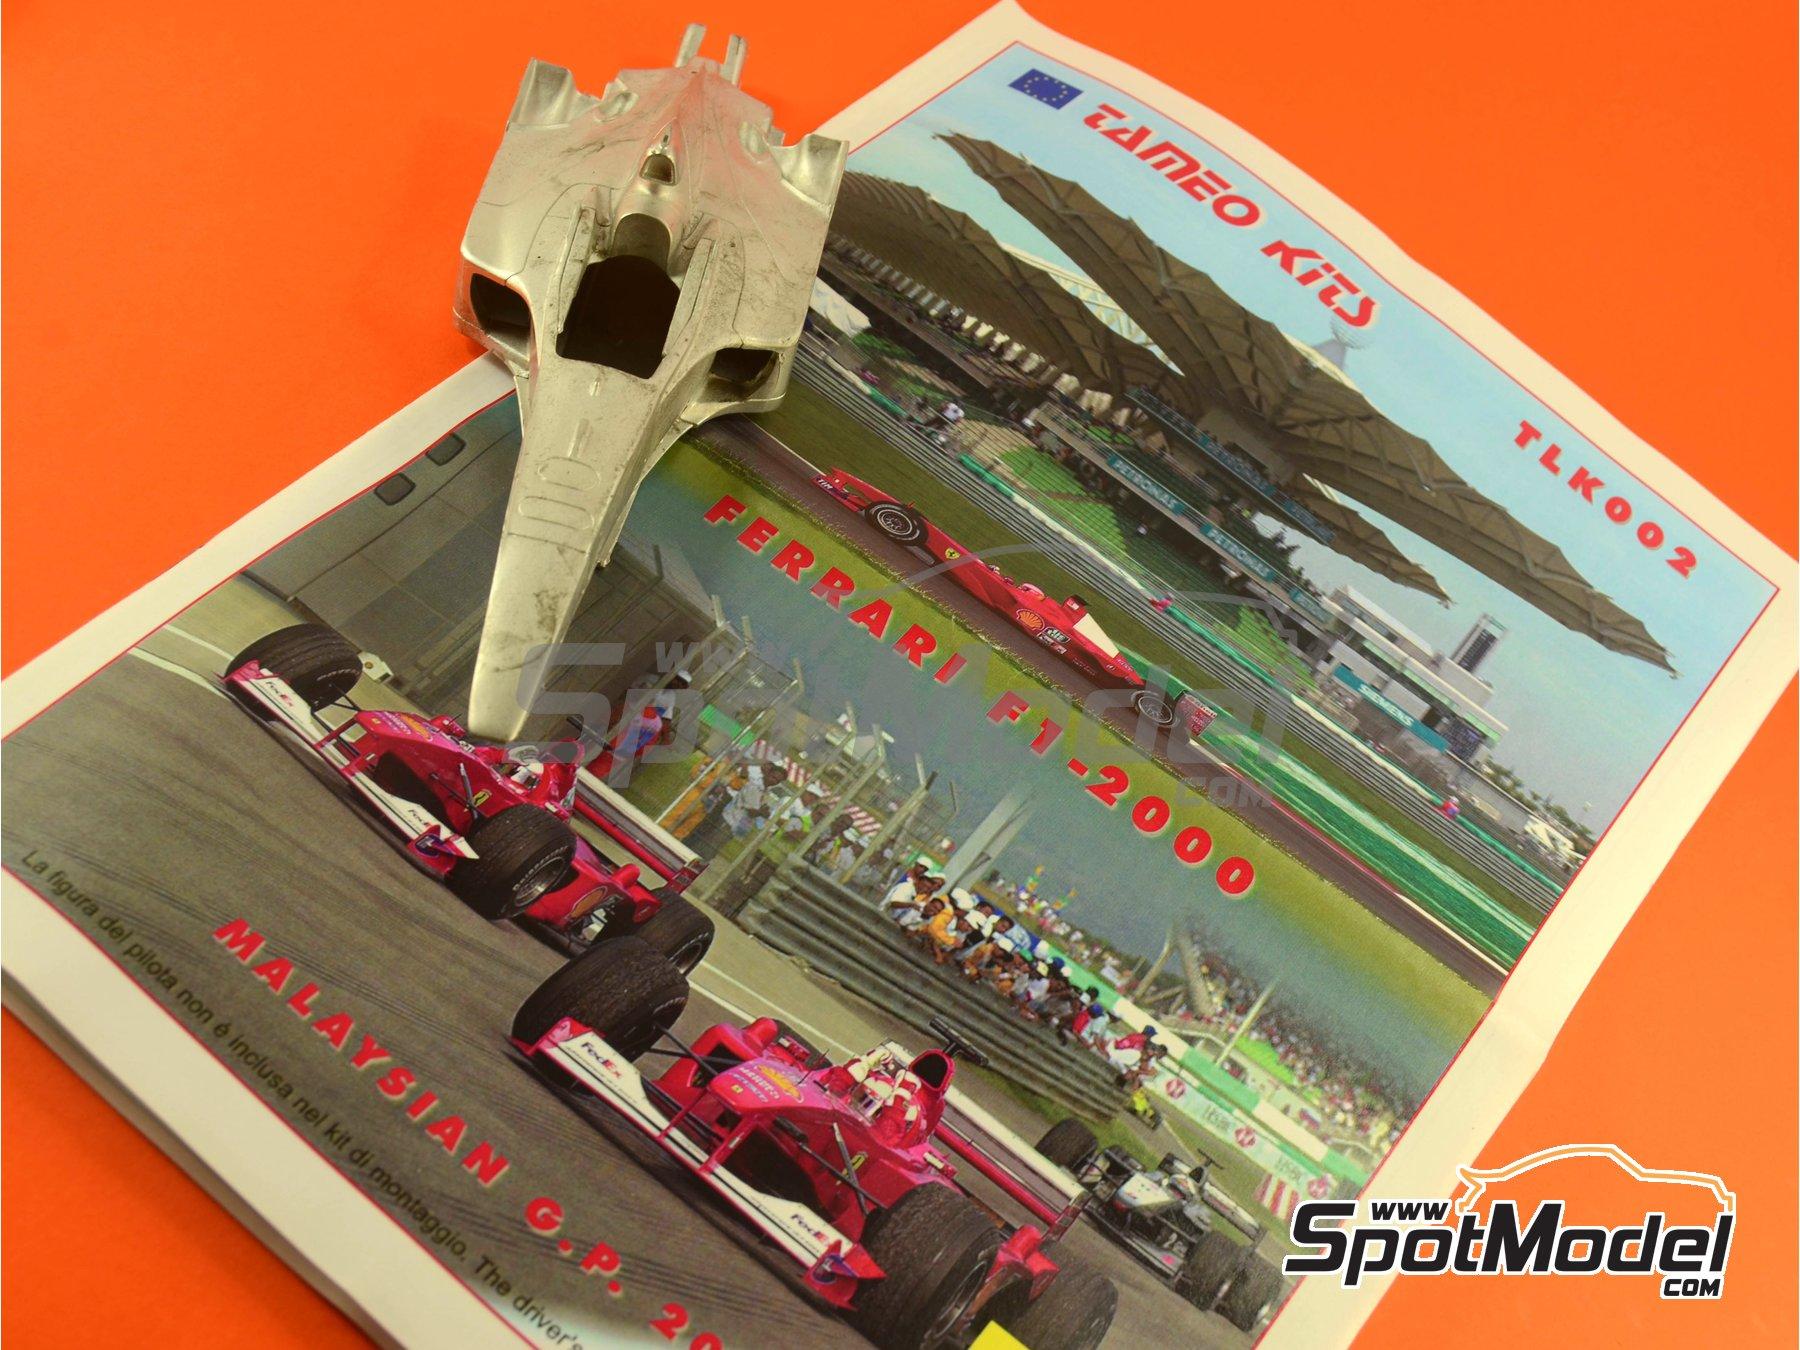 Image 19: Ferrari F1 2000 Marlboro - Gran Premio de Fórmula 1 de Malasia 2000 | Maqueta de coche en escala1/24 fabricado por Tameo Kits (ref.TLK002)